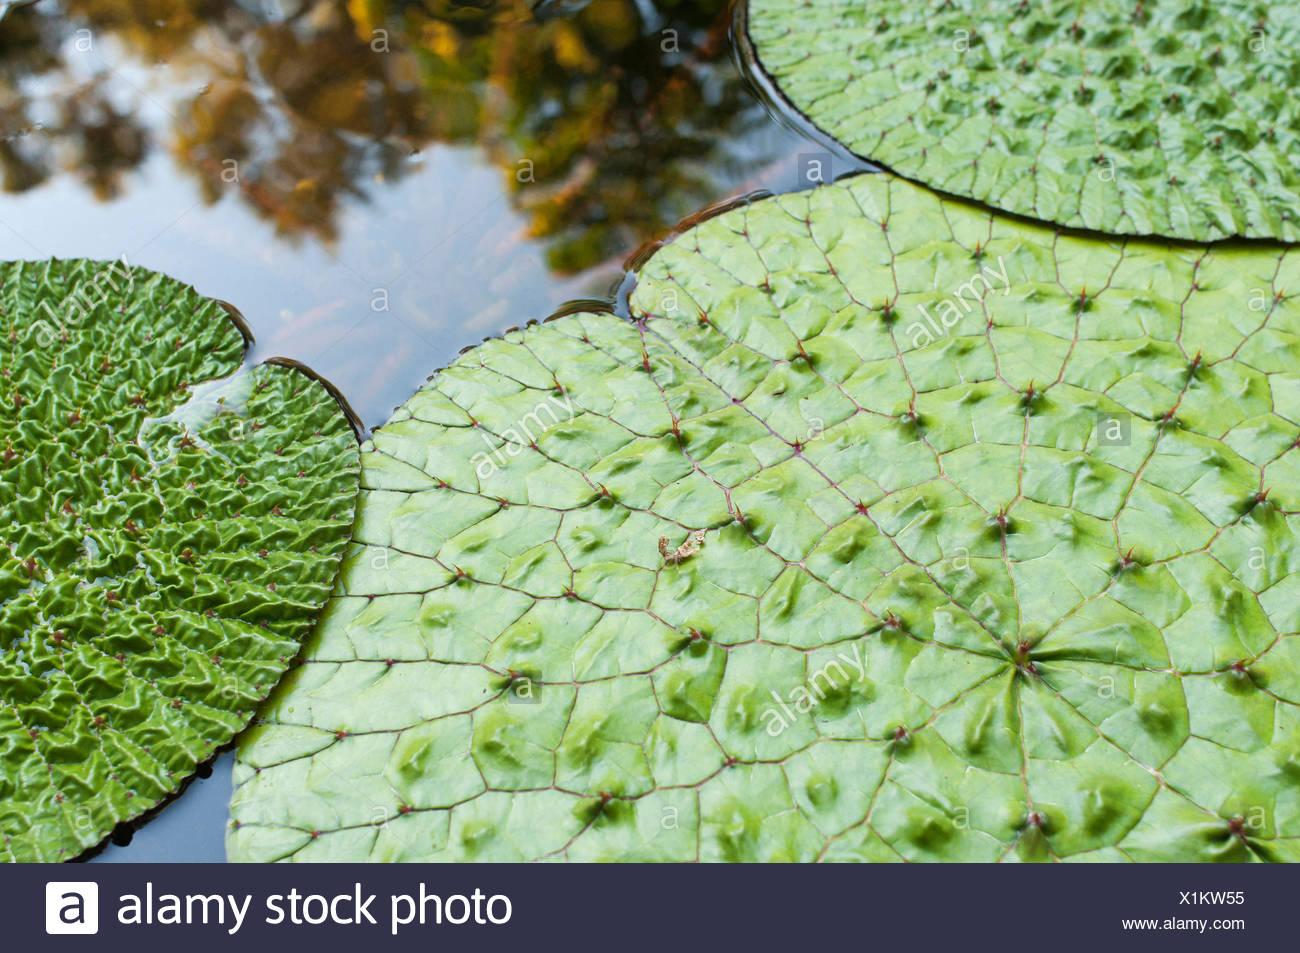 Fox Nut, Euryale ferox, Green subject. - Stock Image